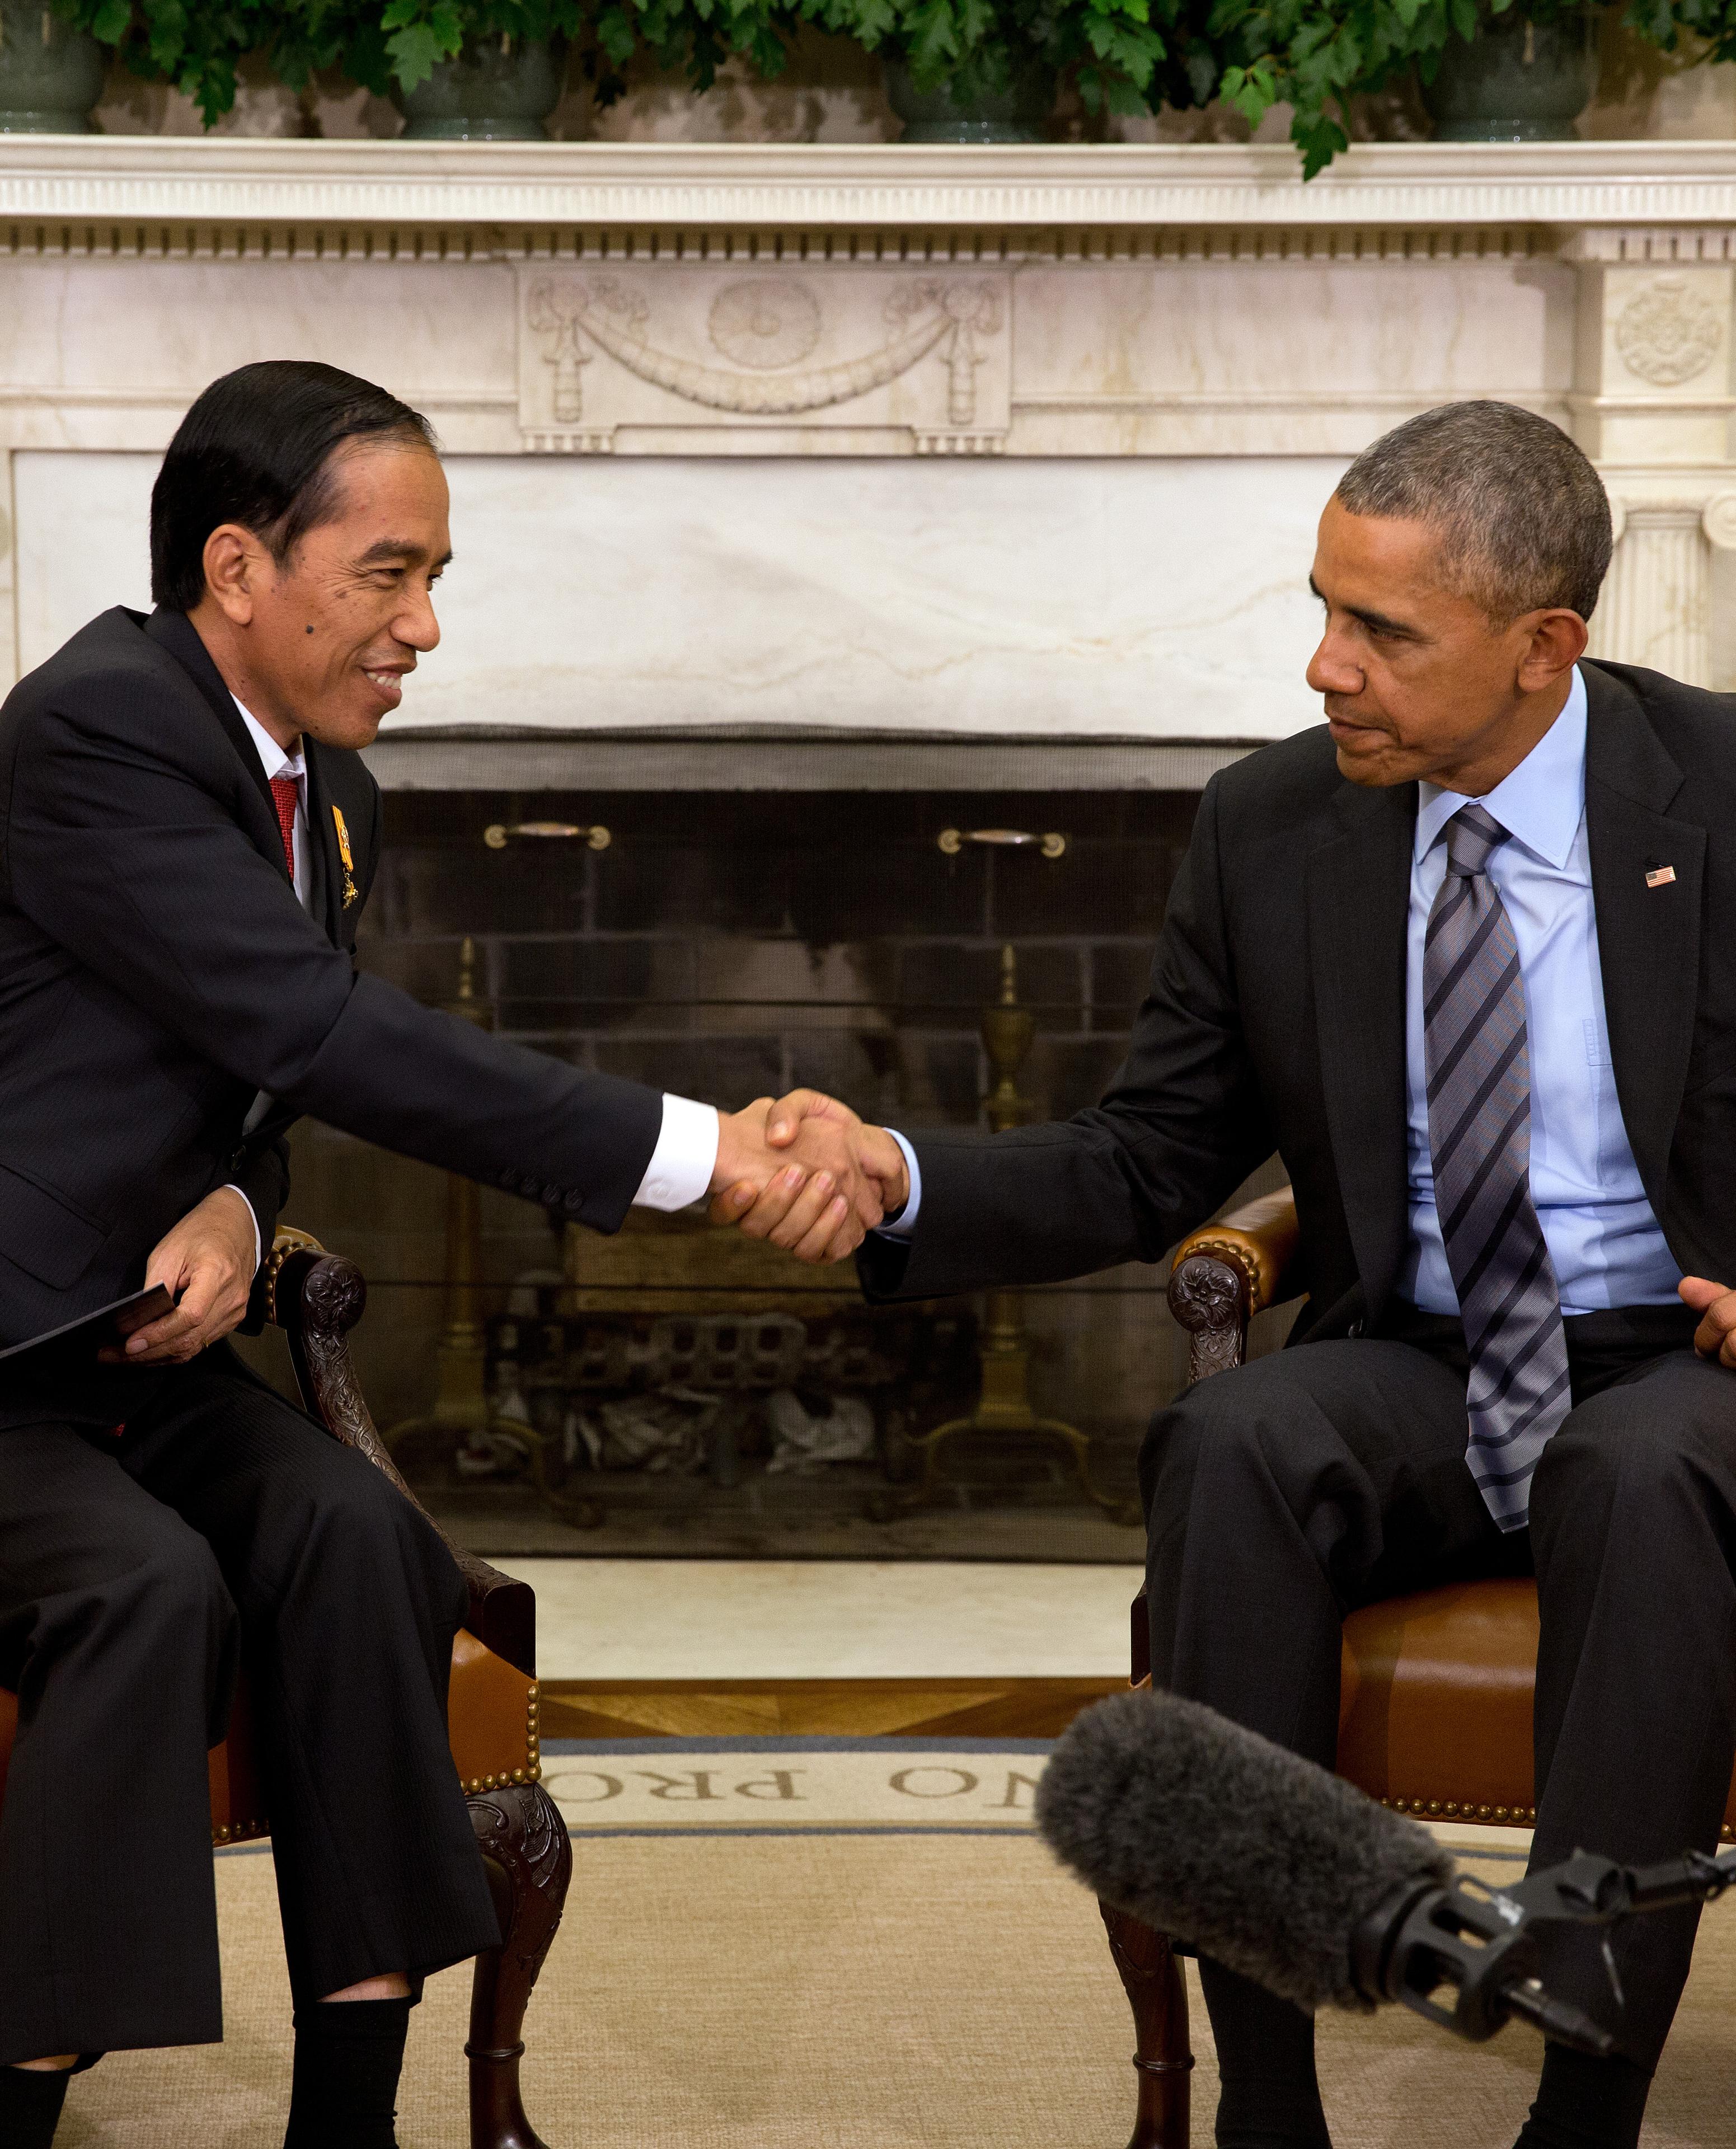 Obama Meets With President Joko Widodo of Indonesia